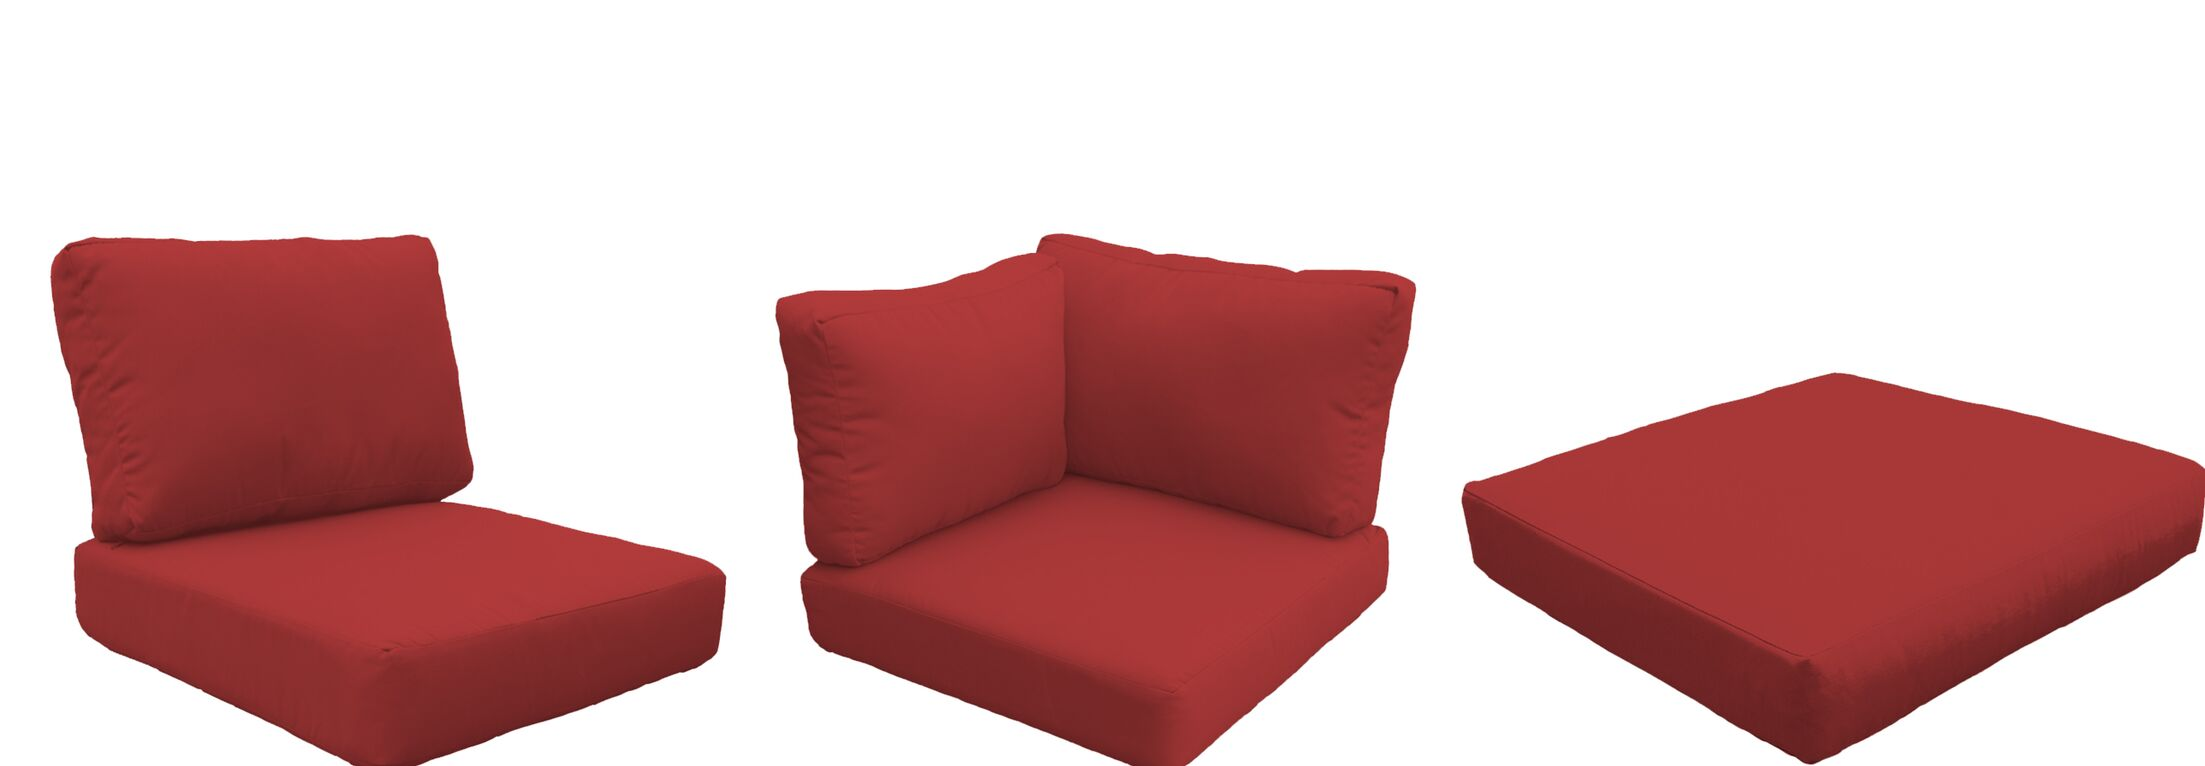 Barbados 14 Piece Outdoor Cushion Set Fabric: Terracotta